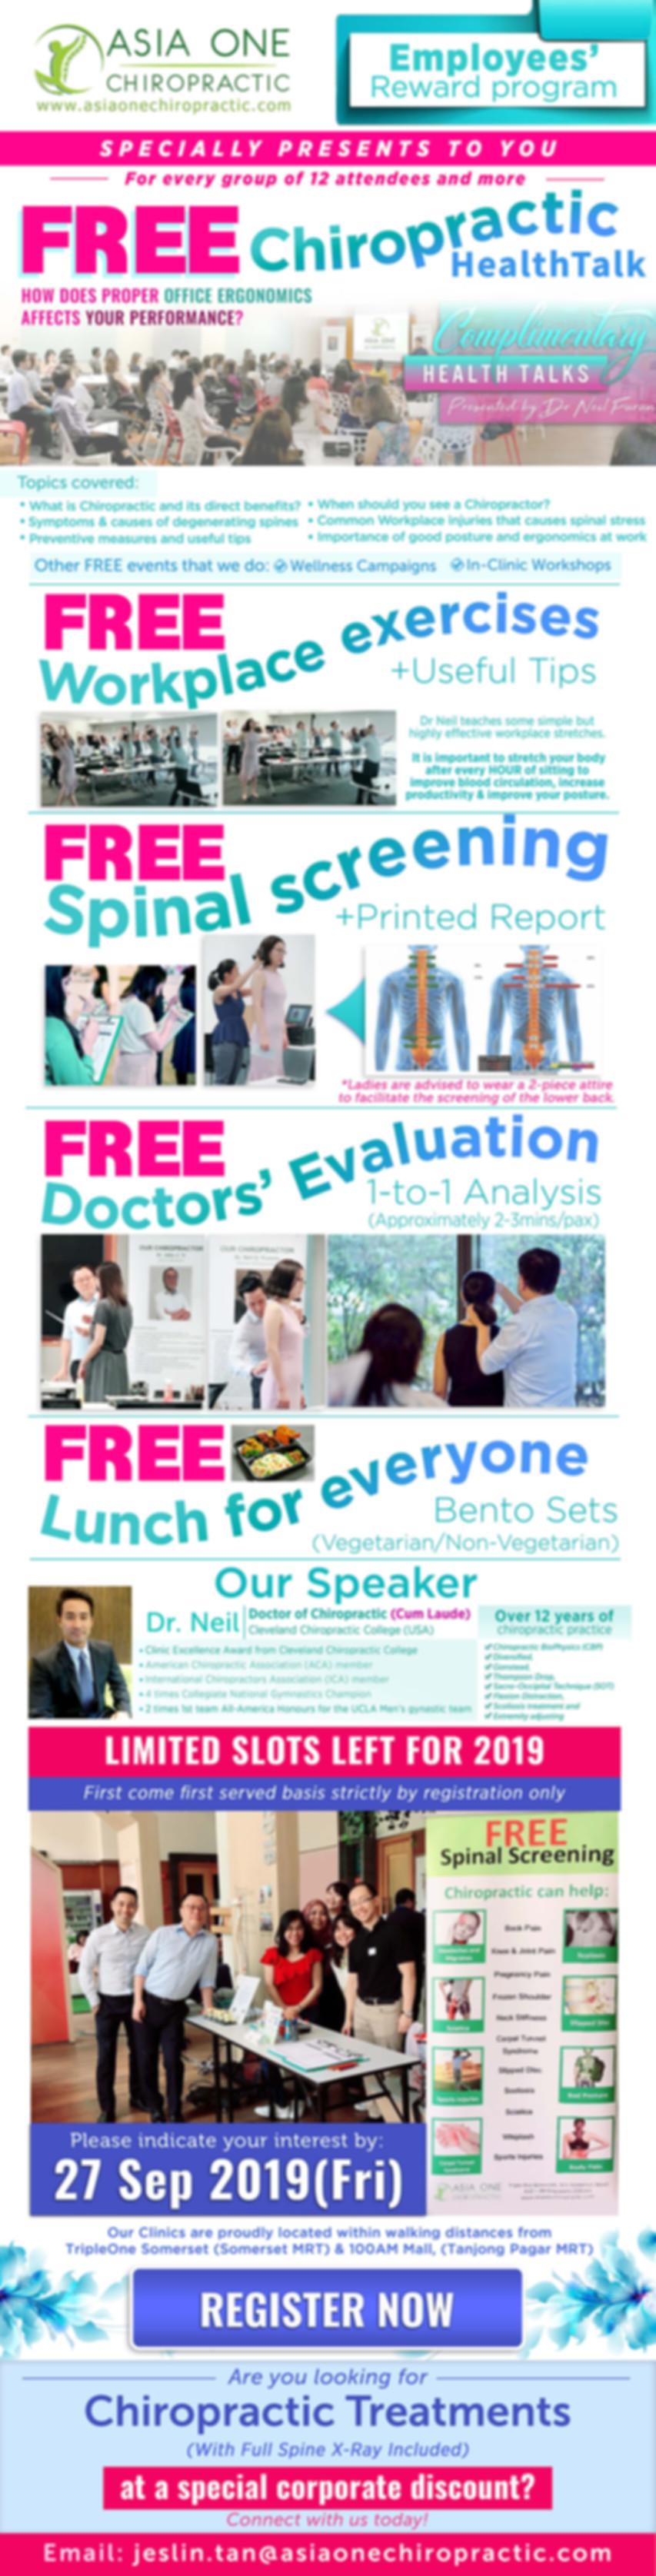 EDM - FREE Chiropractic HealthTalk - By